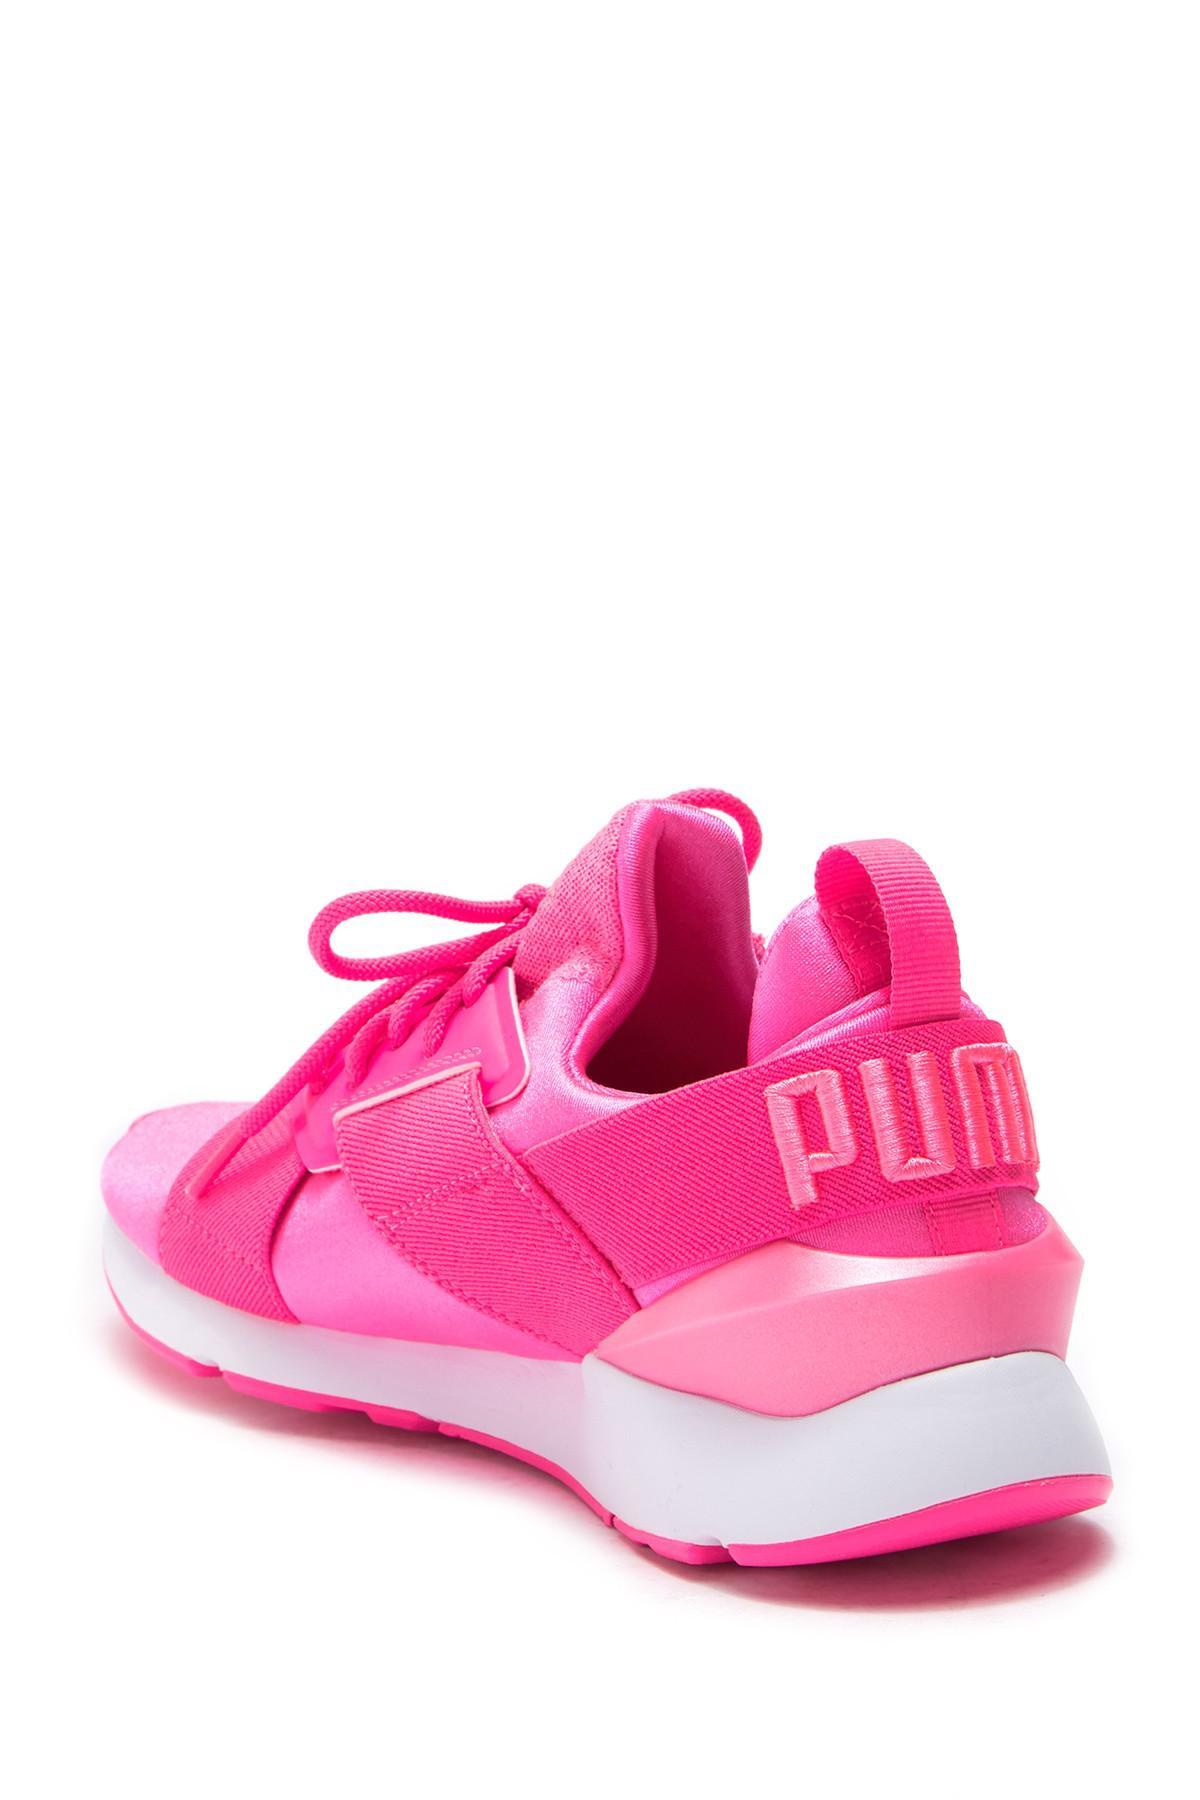 cf4c595330f7 PUMA - Pink Muse Satin Ep - Lyst. View fullscreen